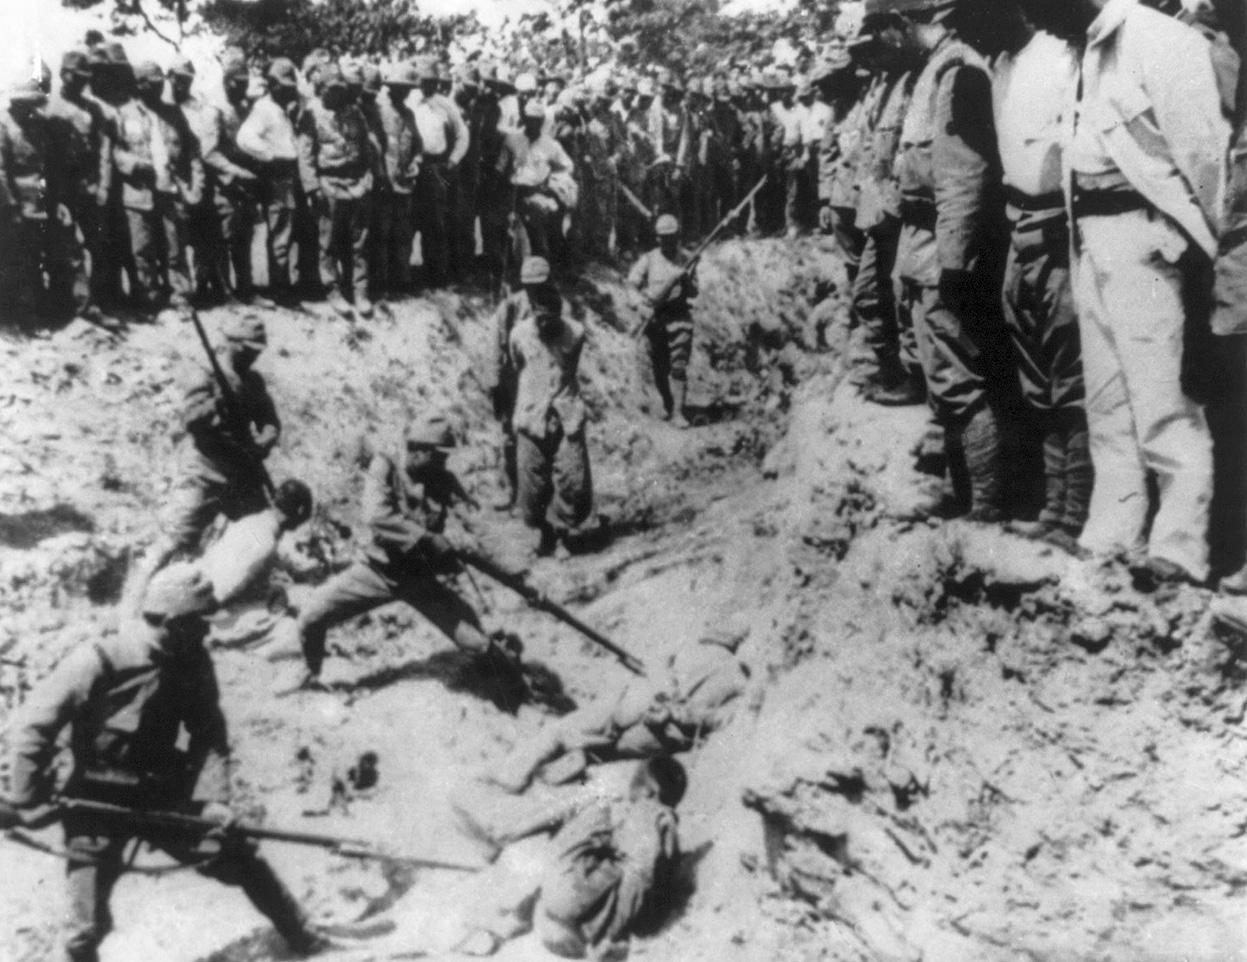 Пытки японцев фото 12 фотография